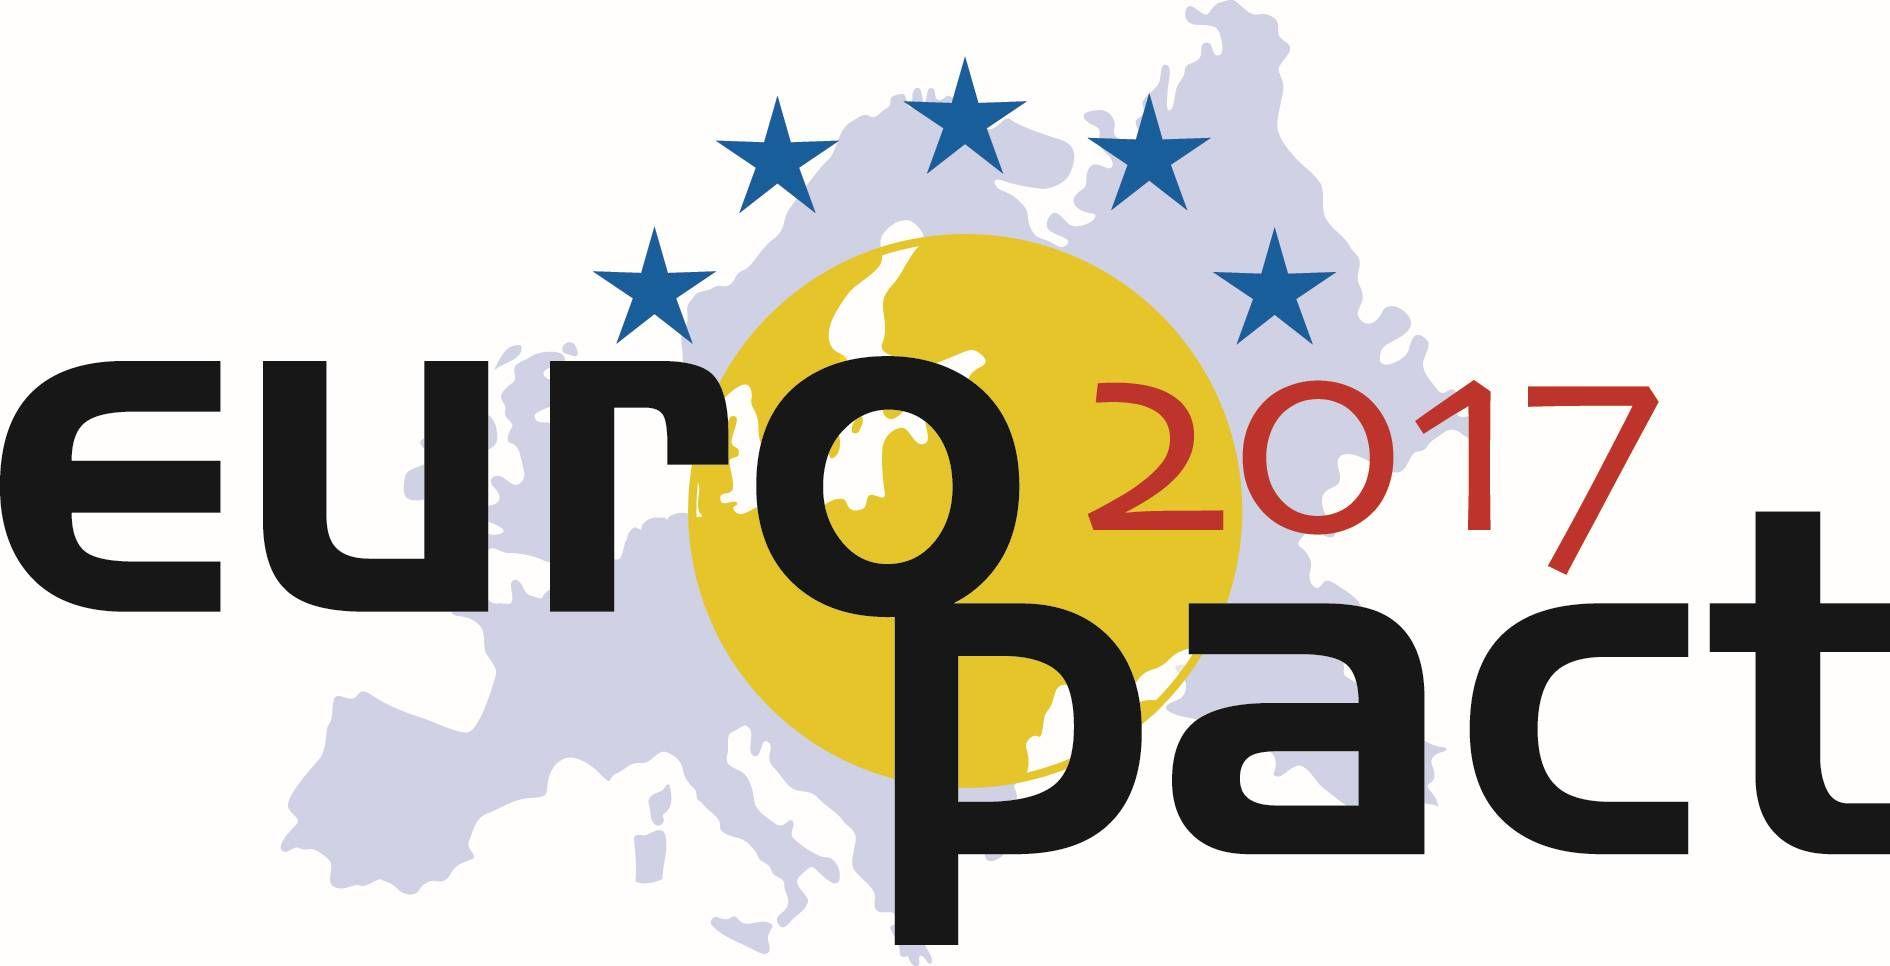 EuroPACT 2017